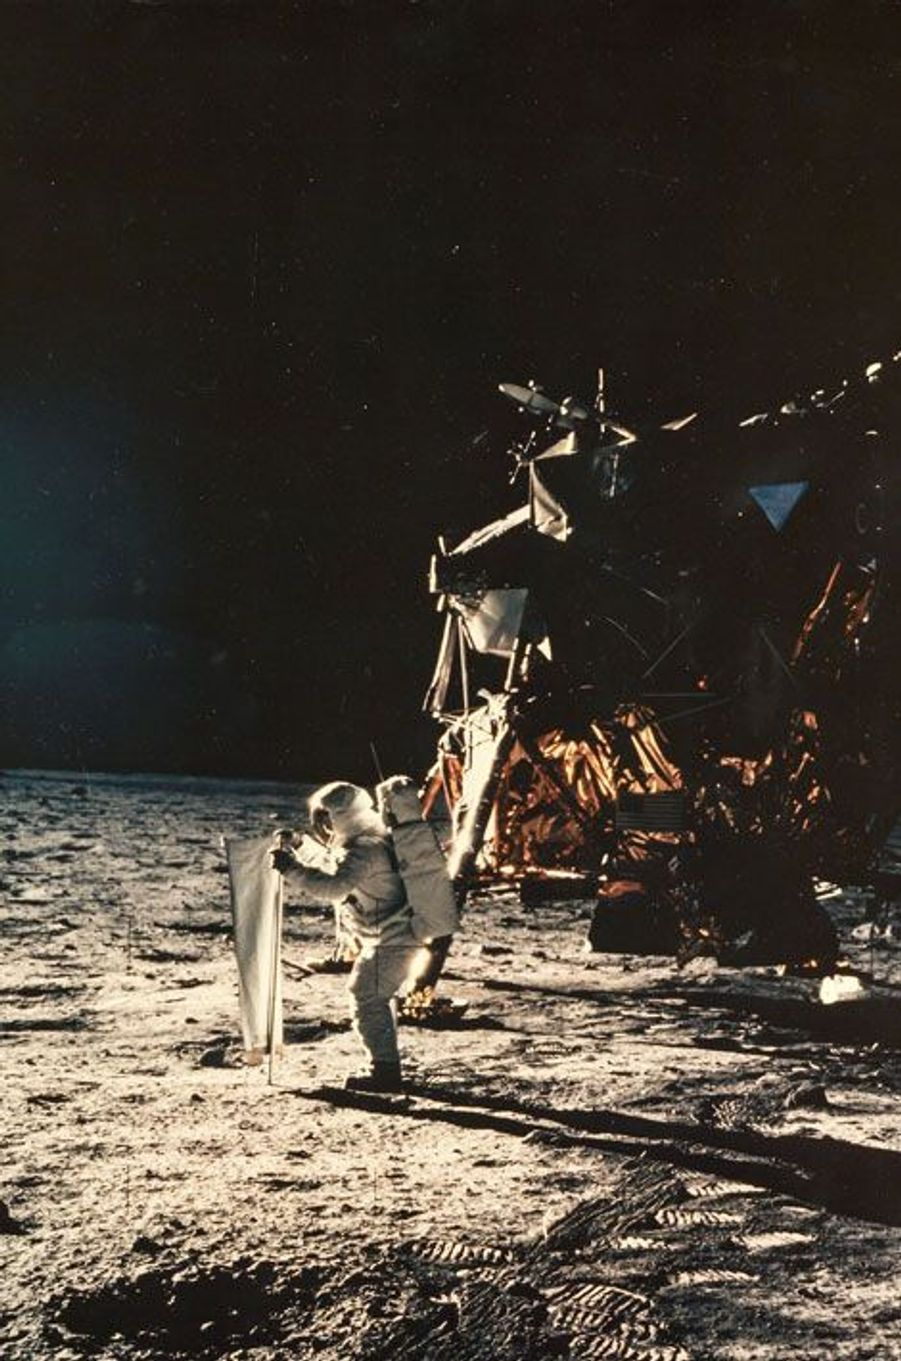 Buzz Aldrin sur la lune, Apollo 11, Juillet 1969